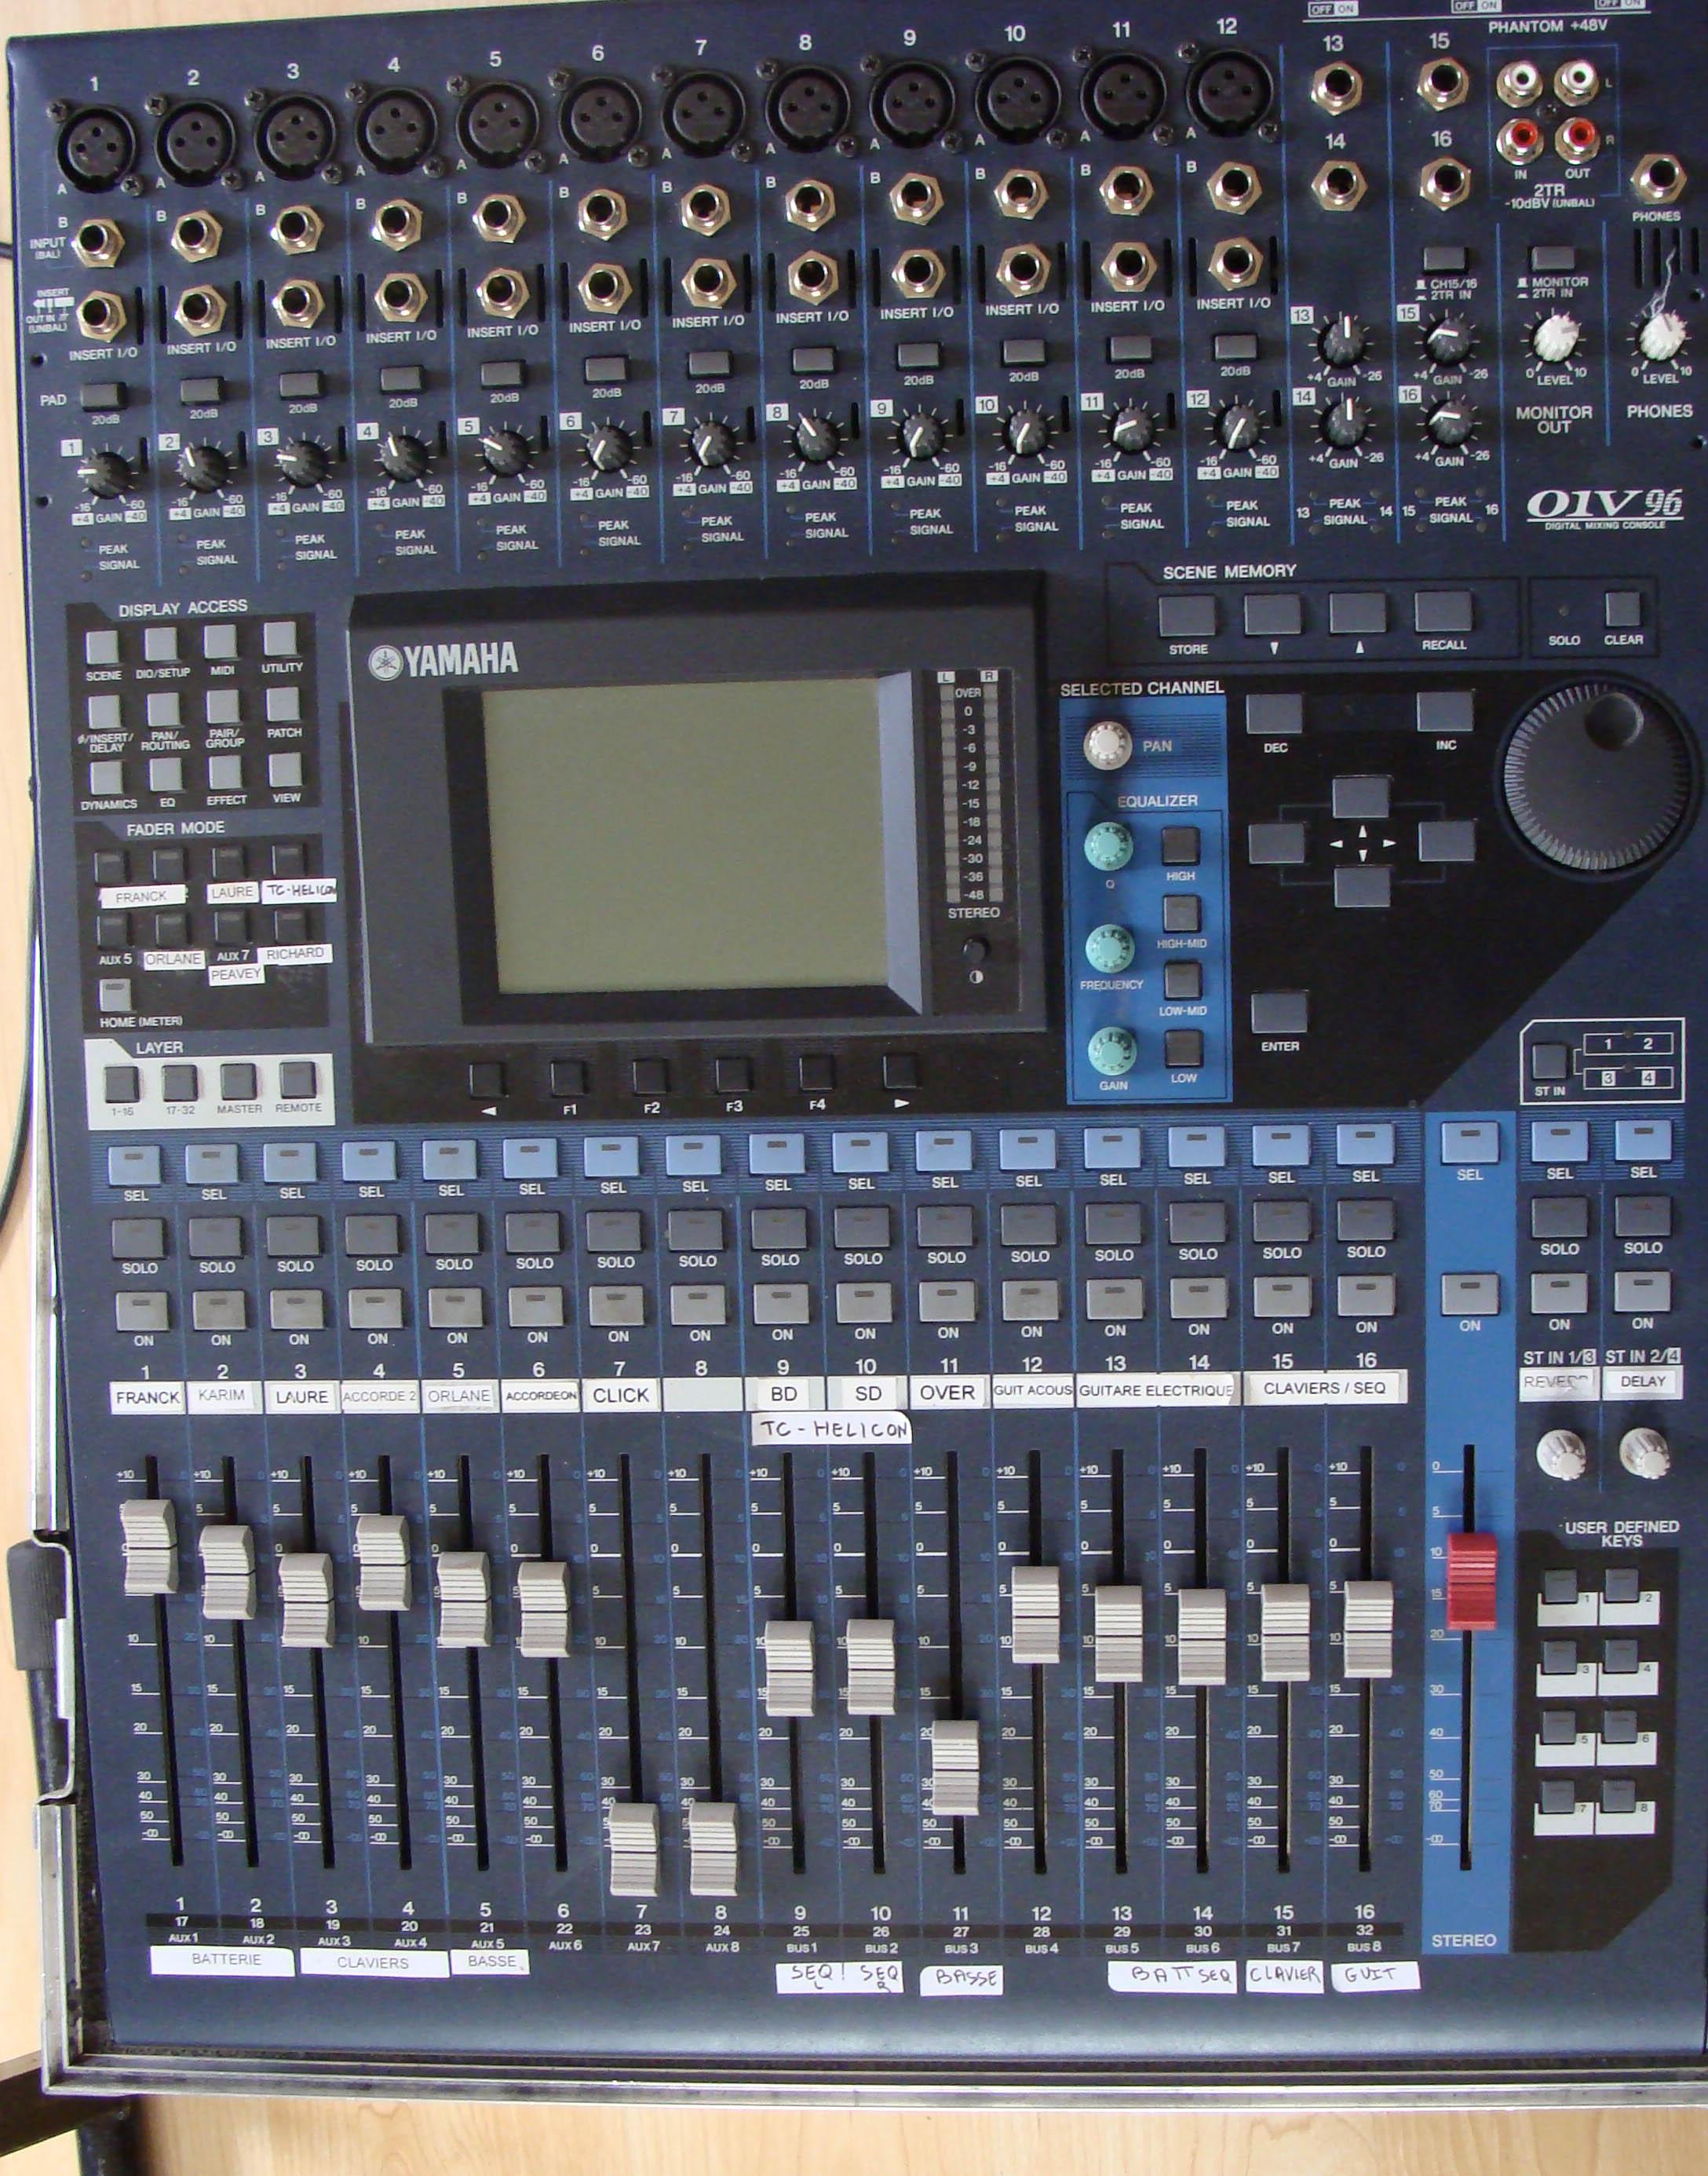 Yamaha 01v Digital Mixer Software : yamaha o1v96 driver for windows 7 ~ Vivirlamusica.com Haus und Dekorationen